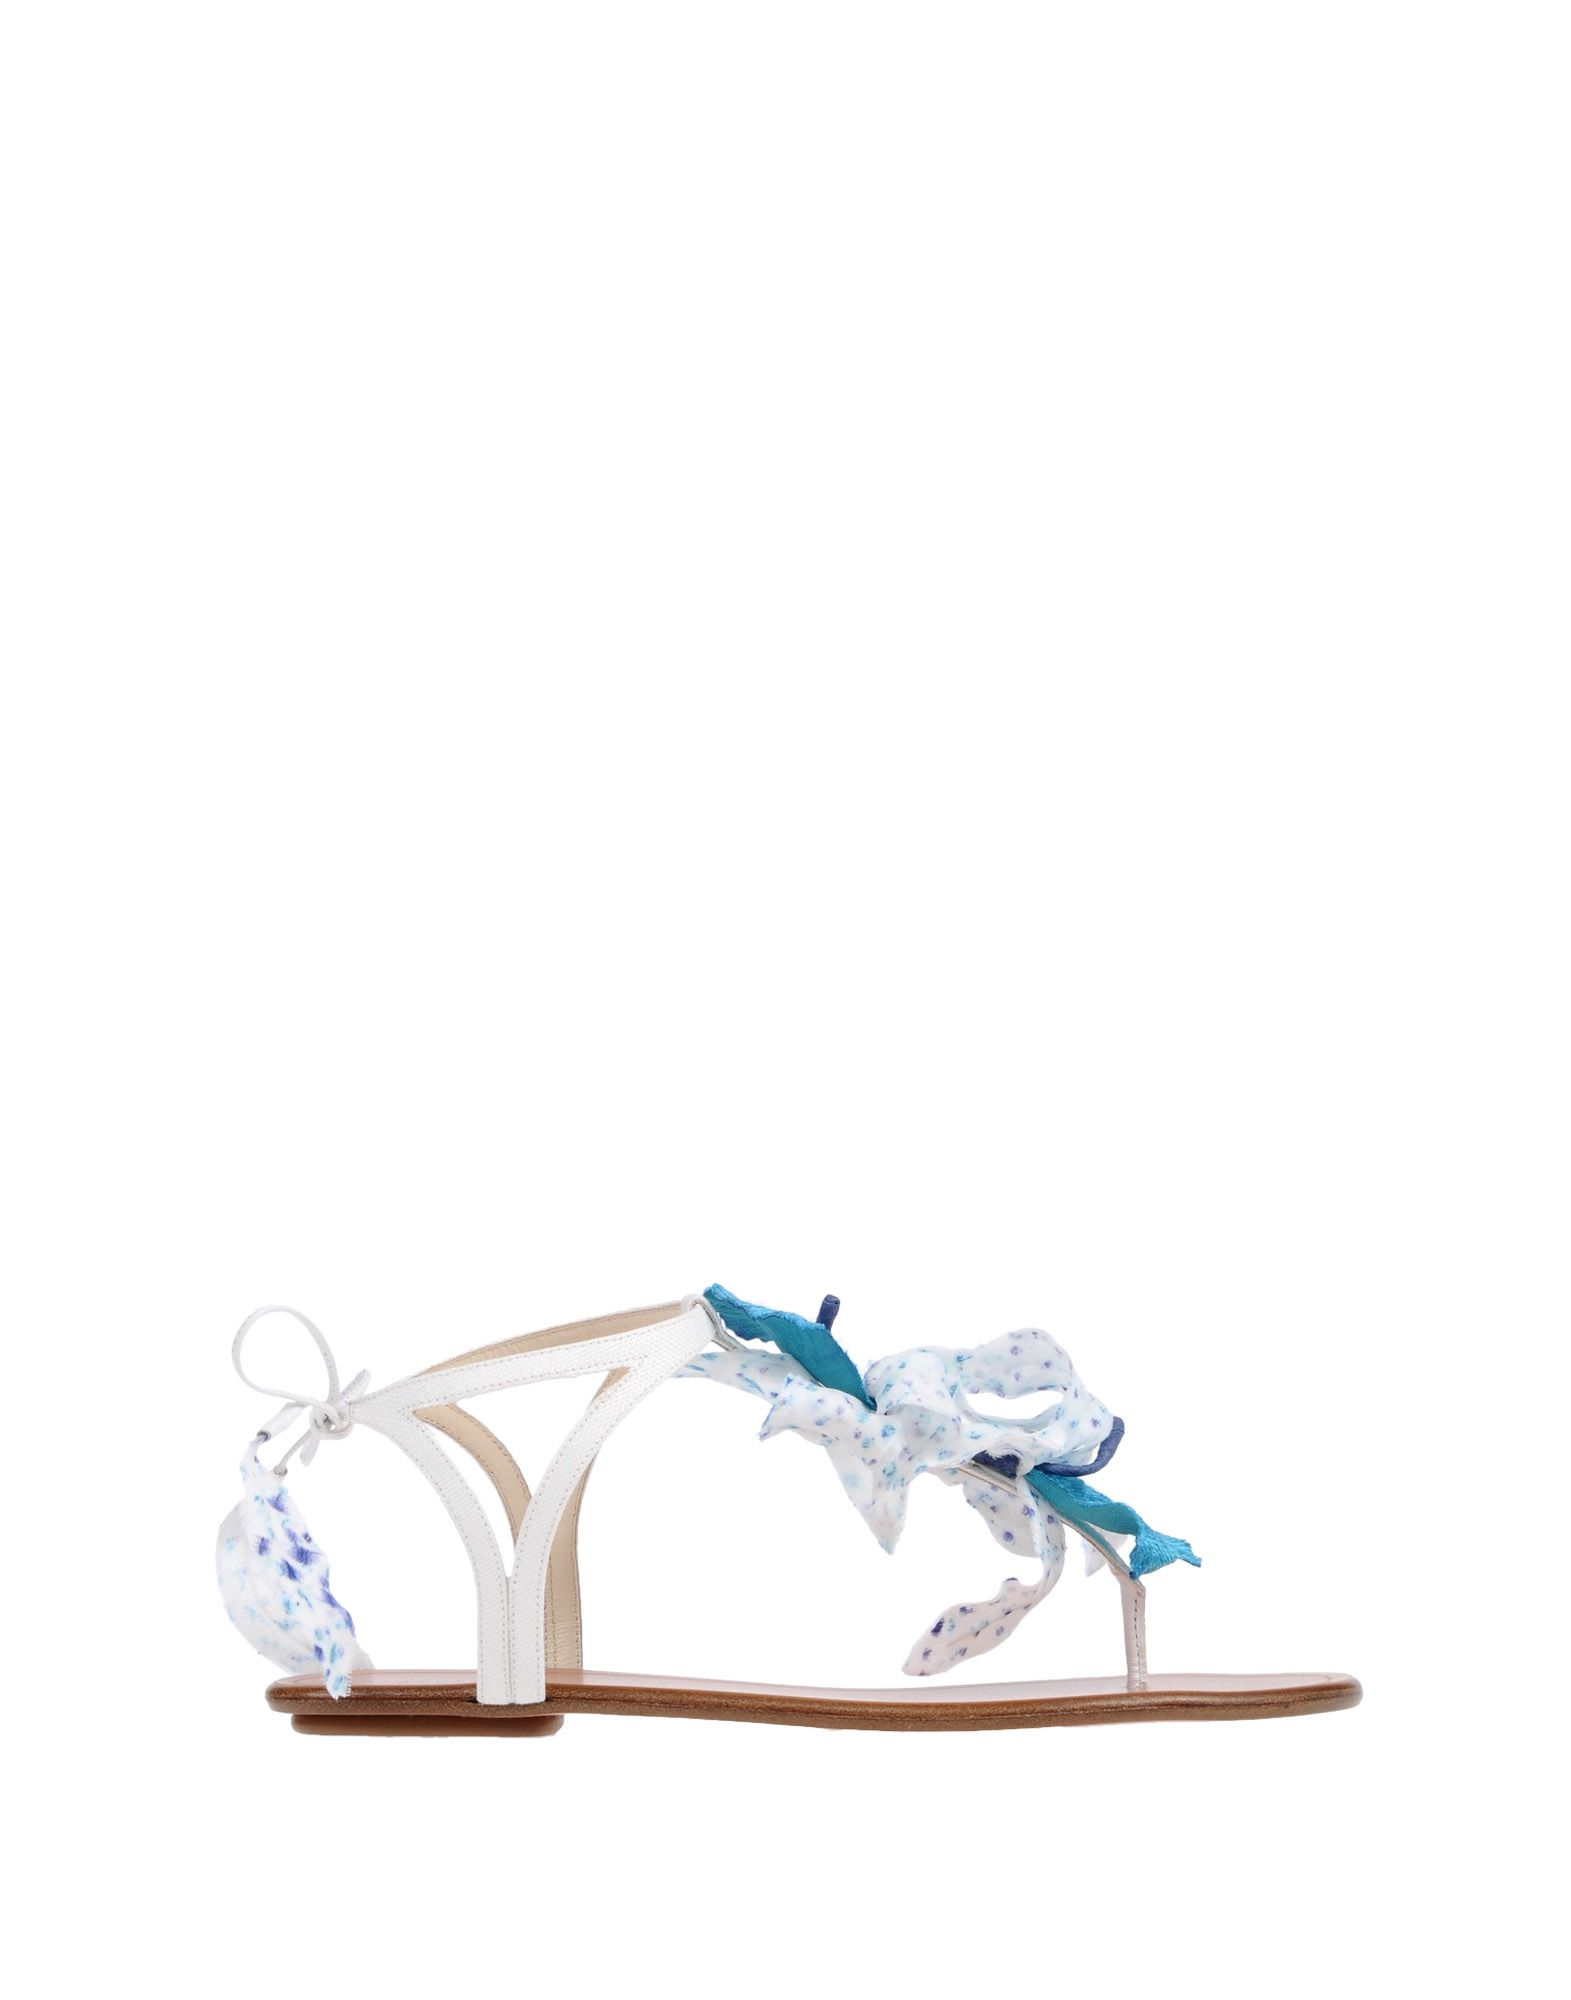 Aquazzura Sandalen Damen gut  11423915AWGünstige gut Damen aussehende Schuhe 9ec7e8